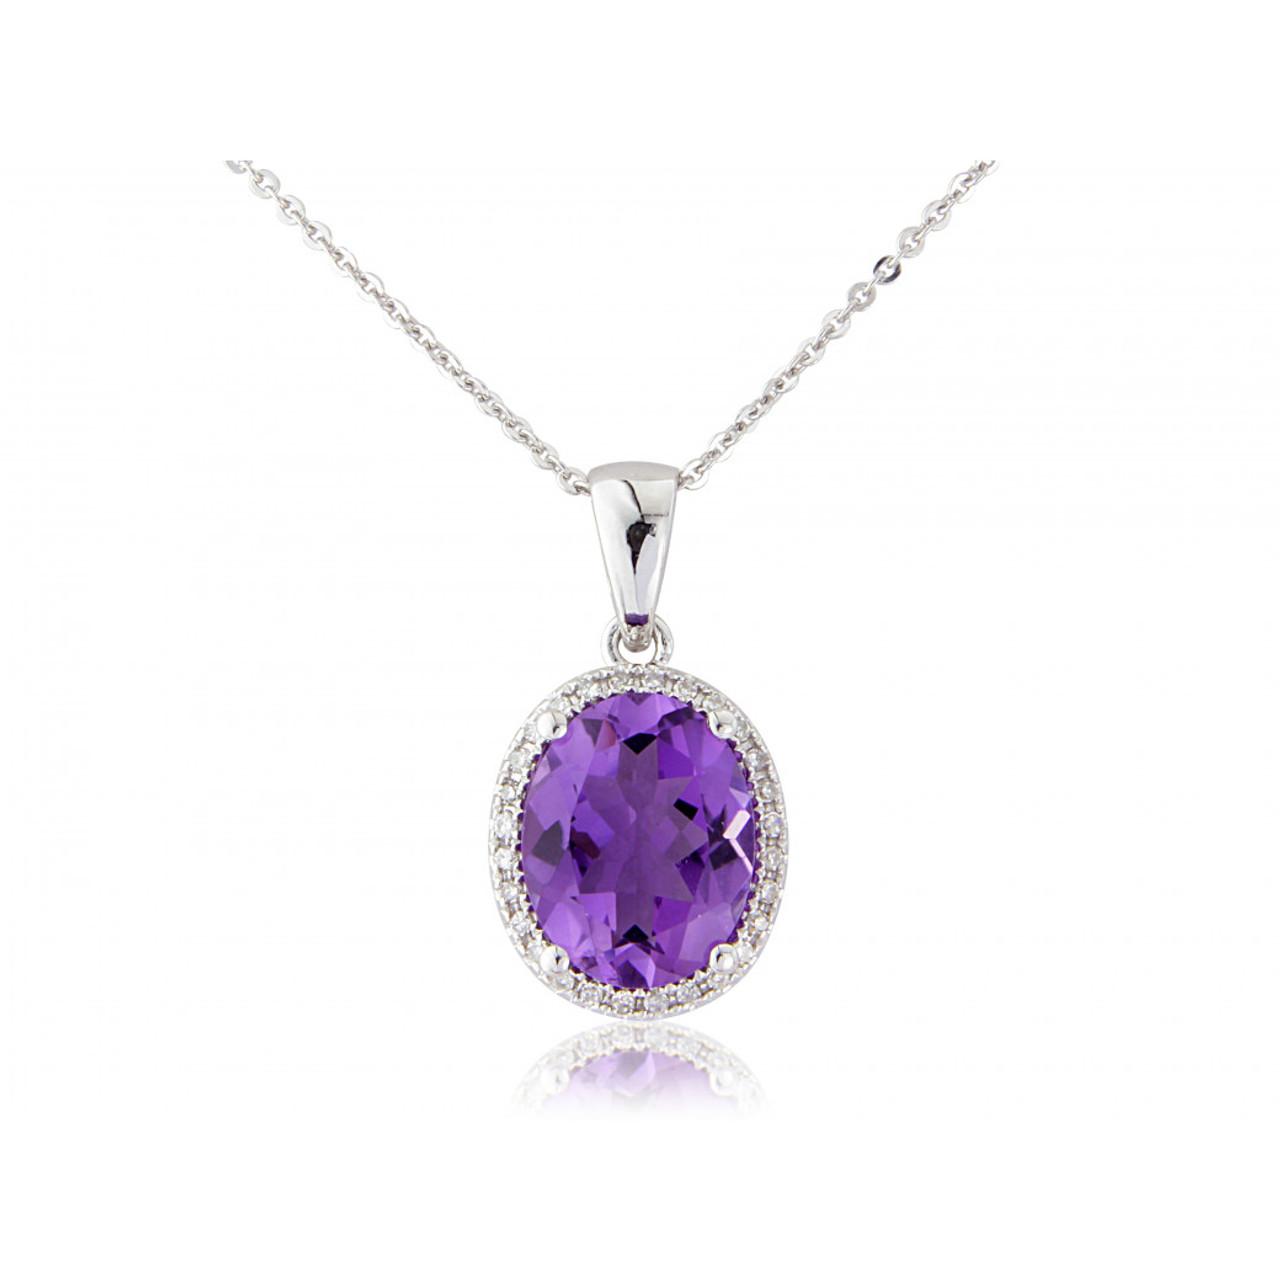 9ct White Gold Amethyst & Diamond Pendant Necklace